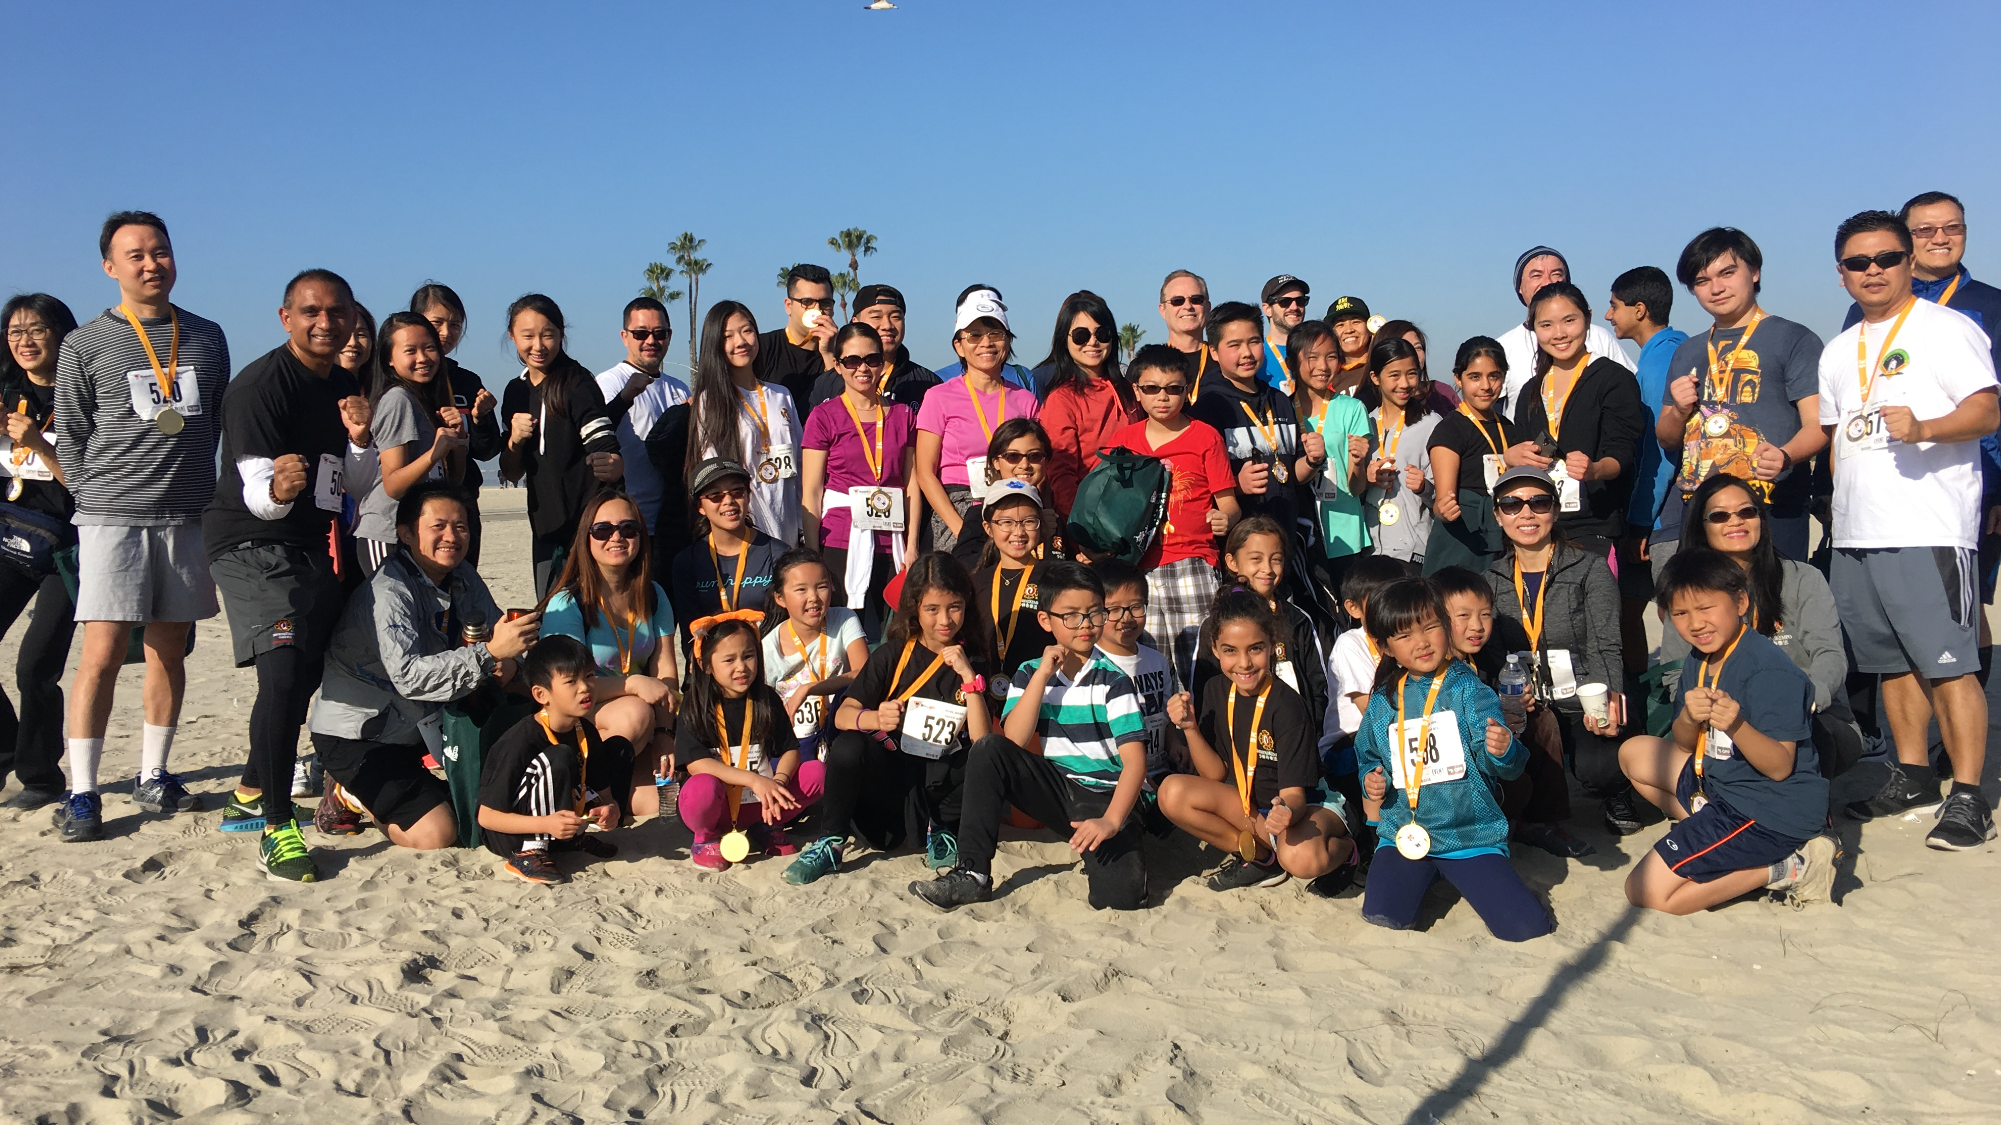 10km Shorinji Kempo Charity Run 2018 in Long Beach CA